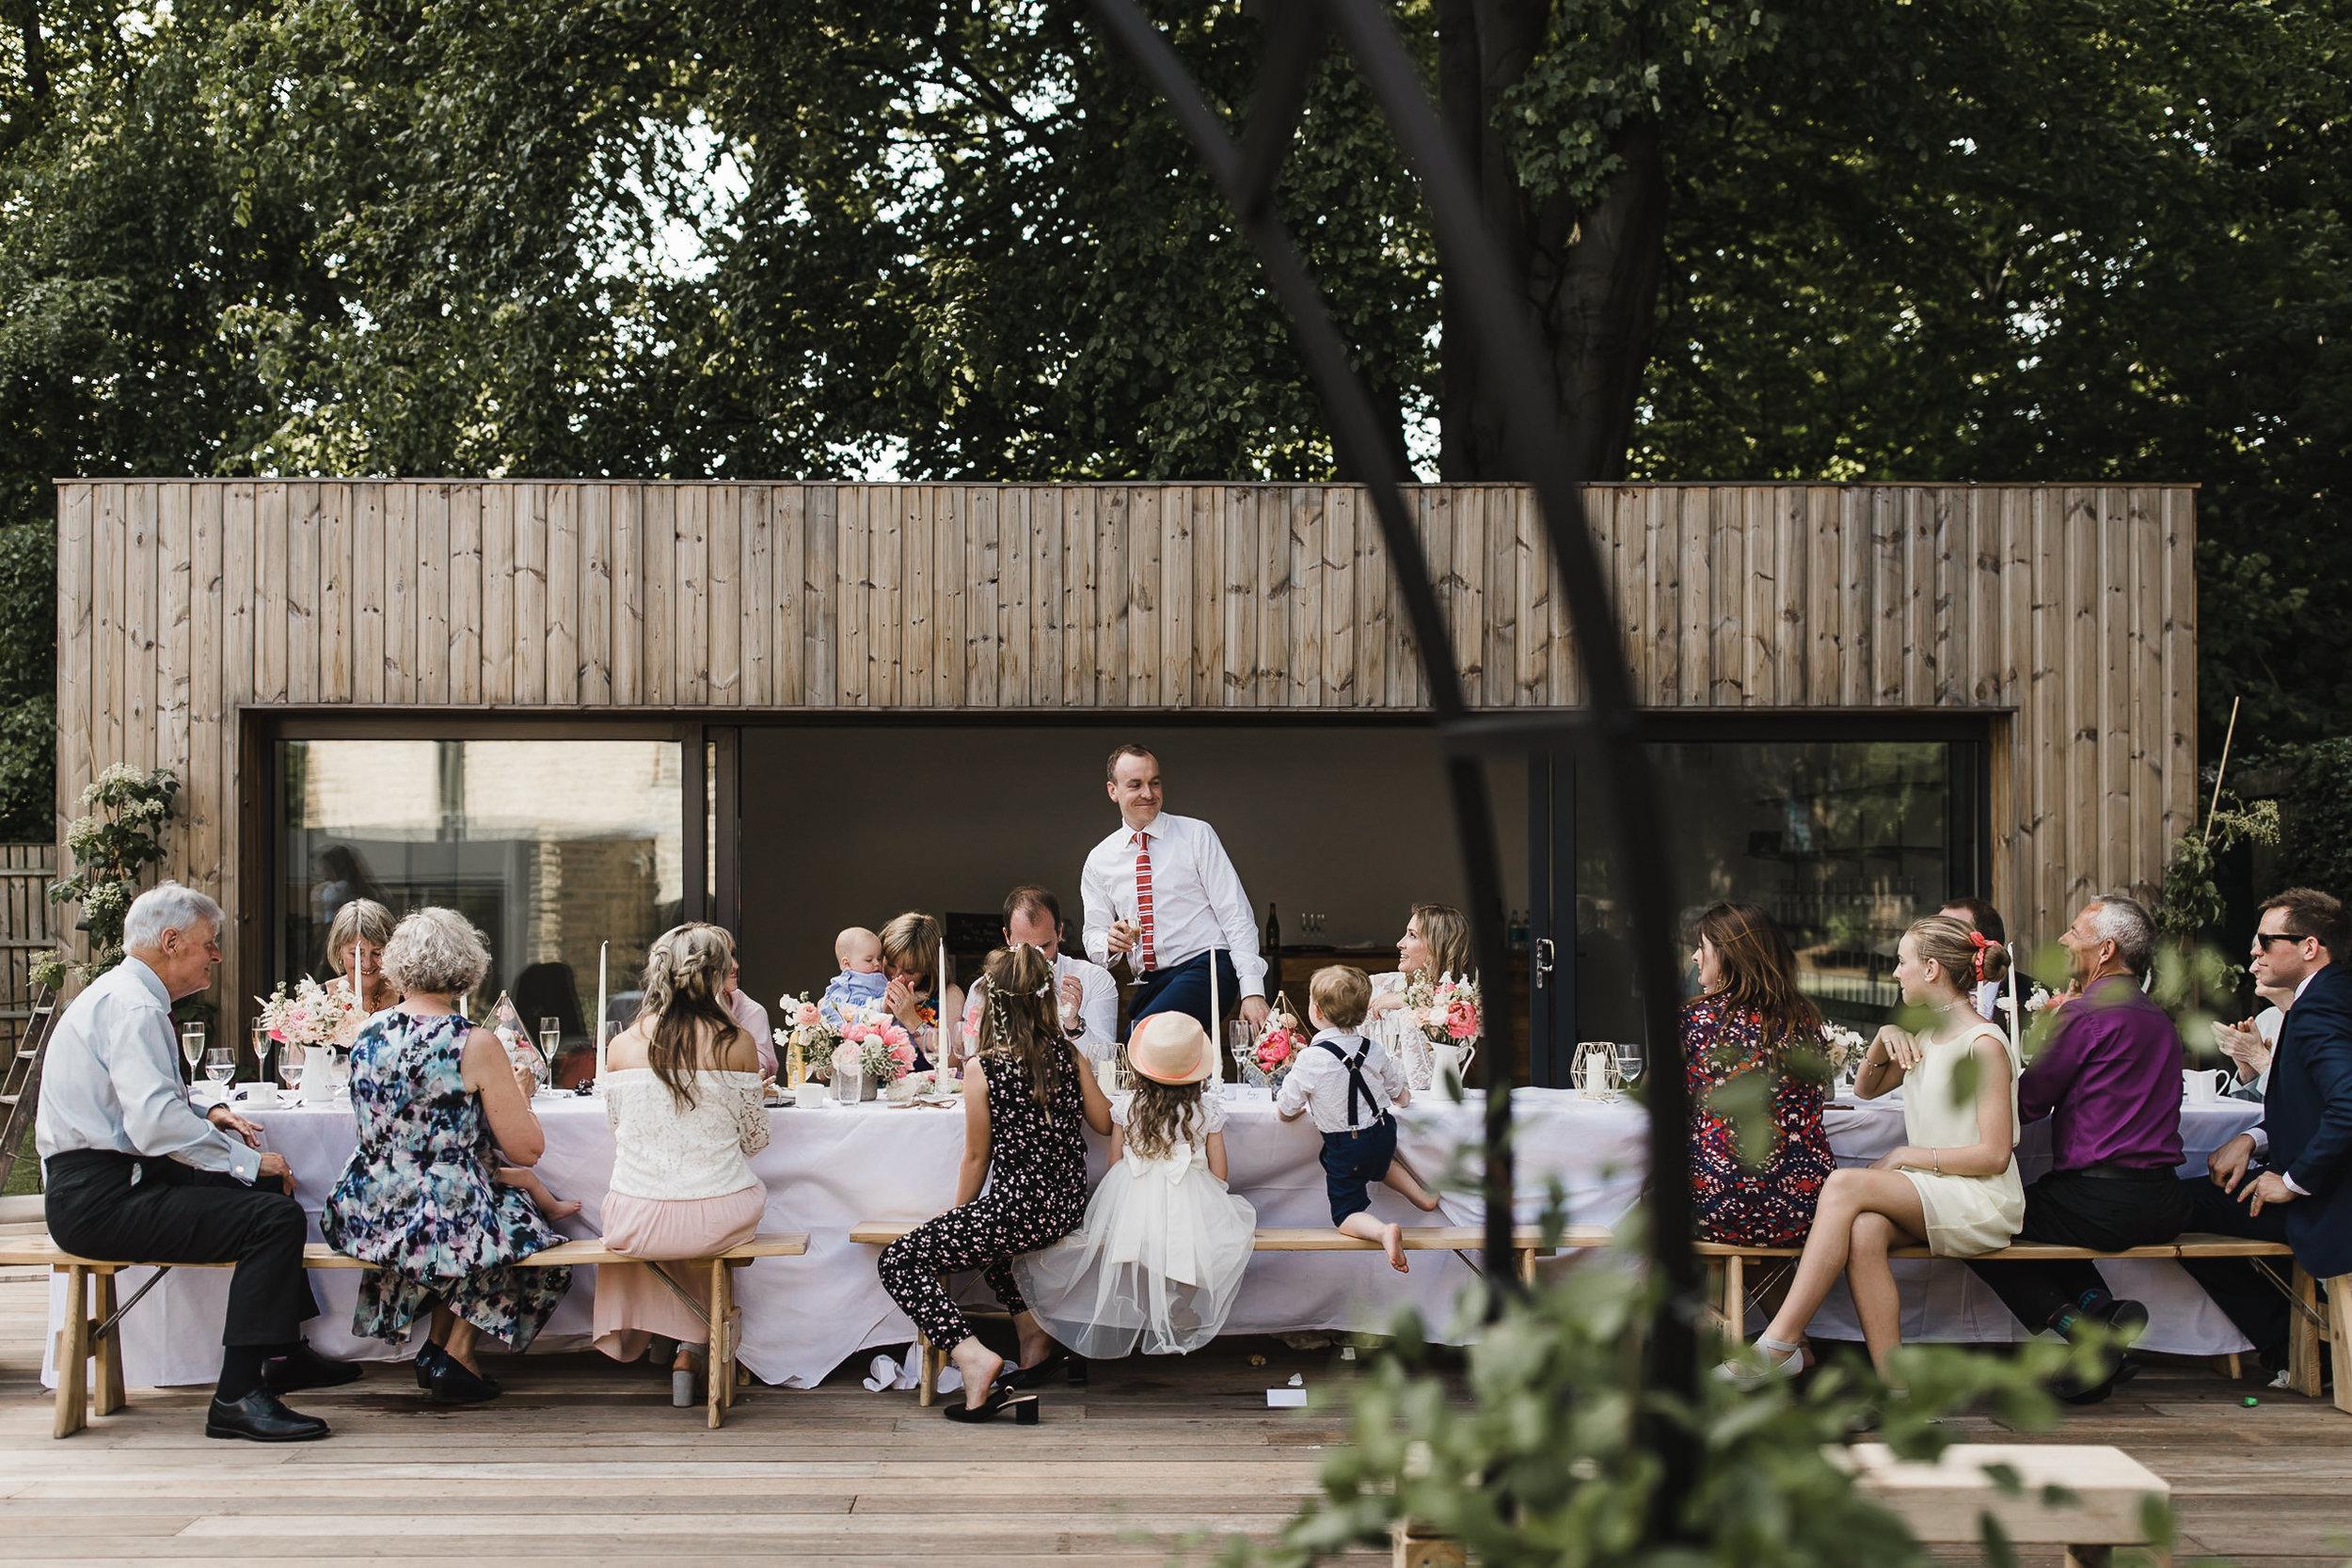 Roundhay-Leeds-Backyard-Wedding-Becs-Chris-164.jpg